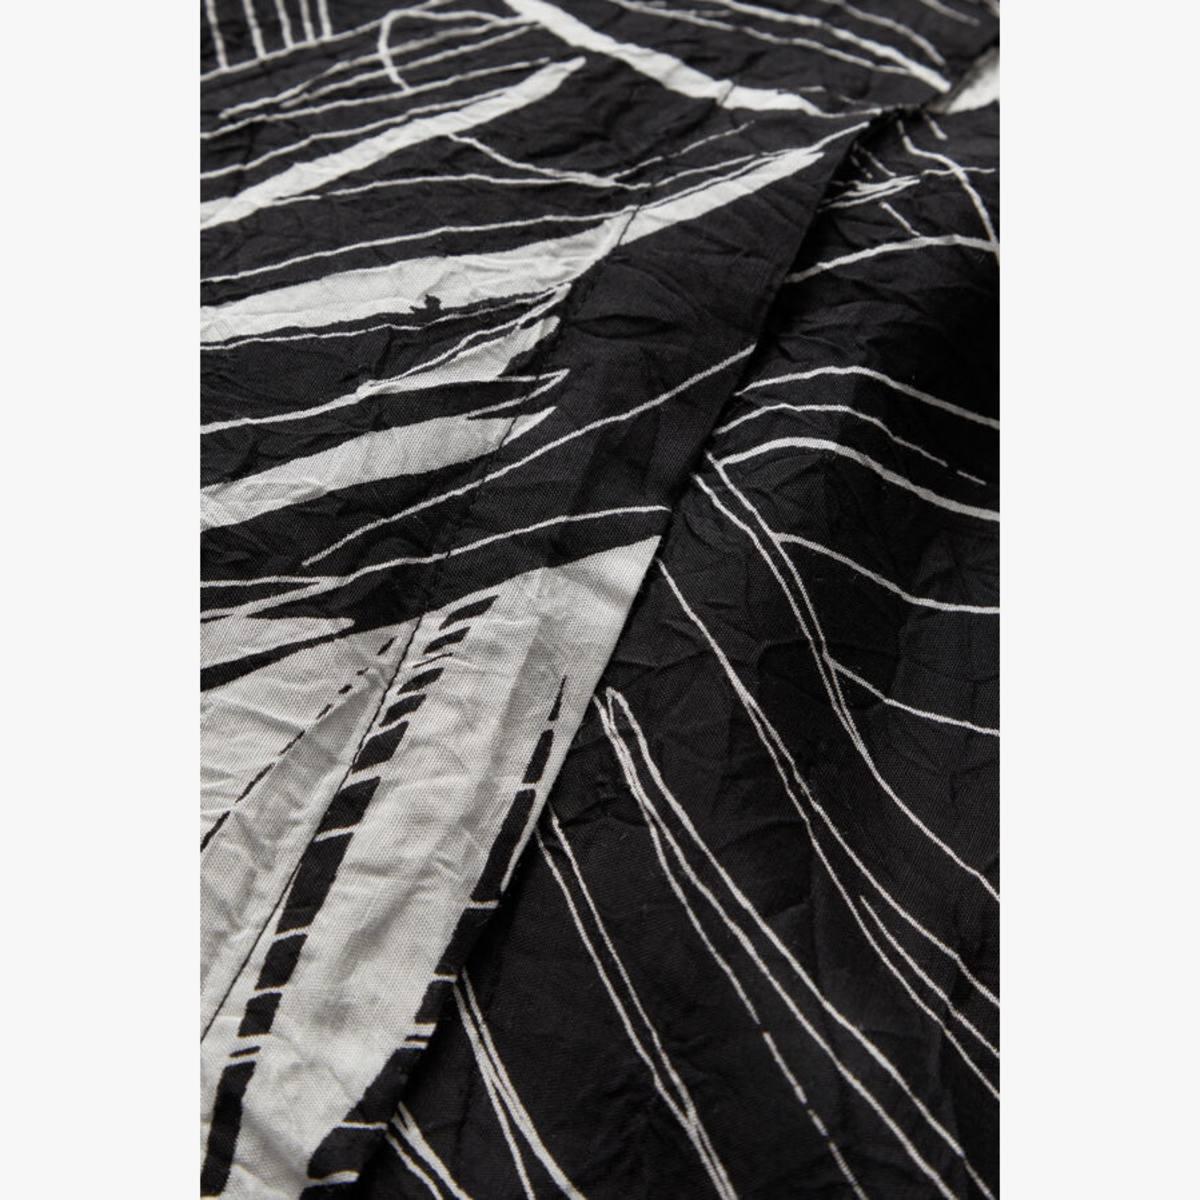 Geam Black/Cream Print Shirt By Masai | Restoration Yard